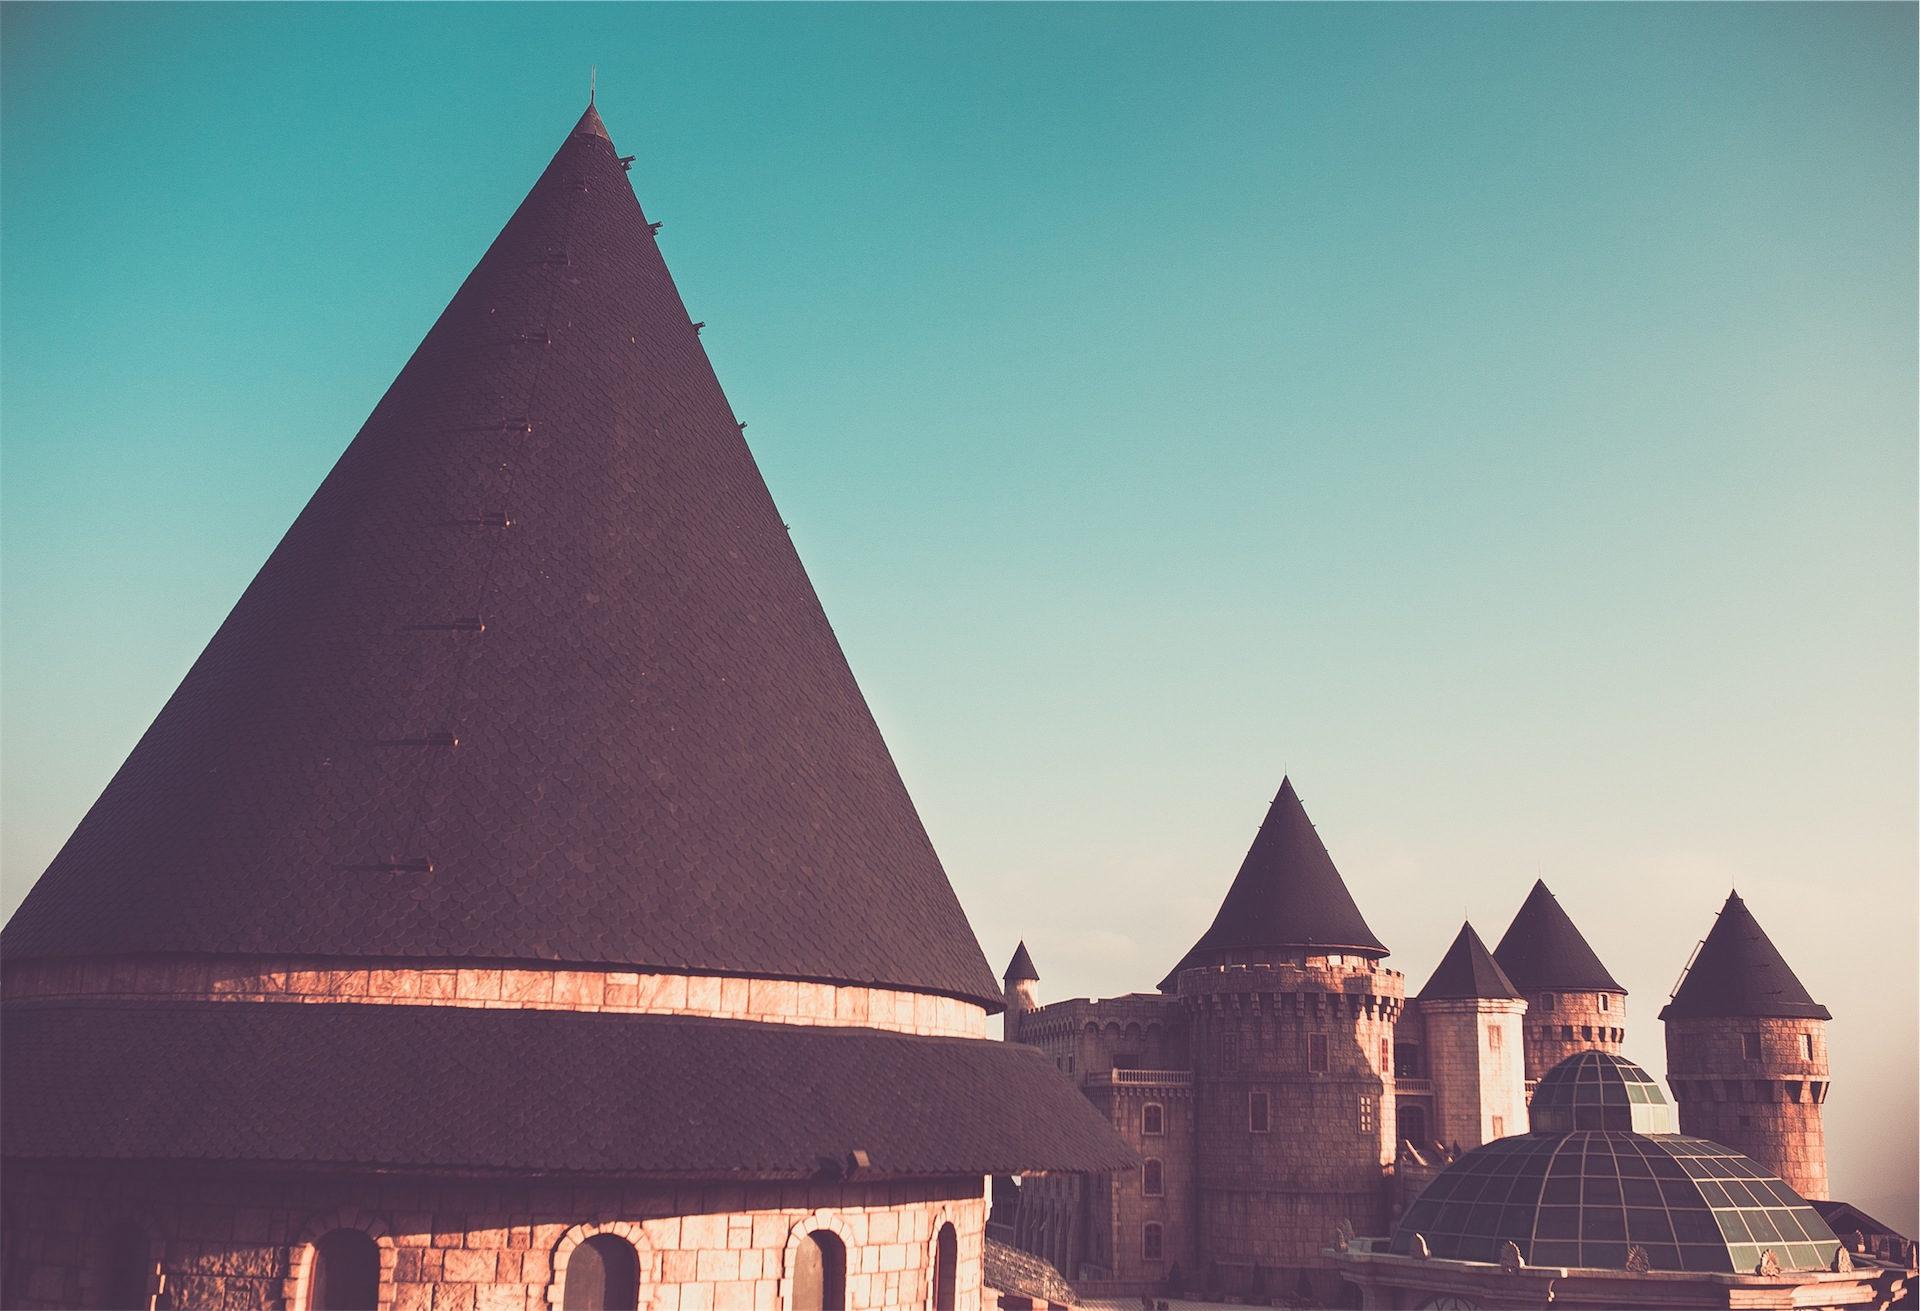 castillo, torres, torreón, fortaleza, cielo - Fondos de Pantalla HD - professor-falken.com